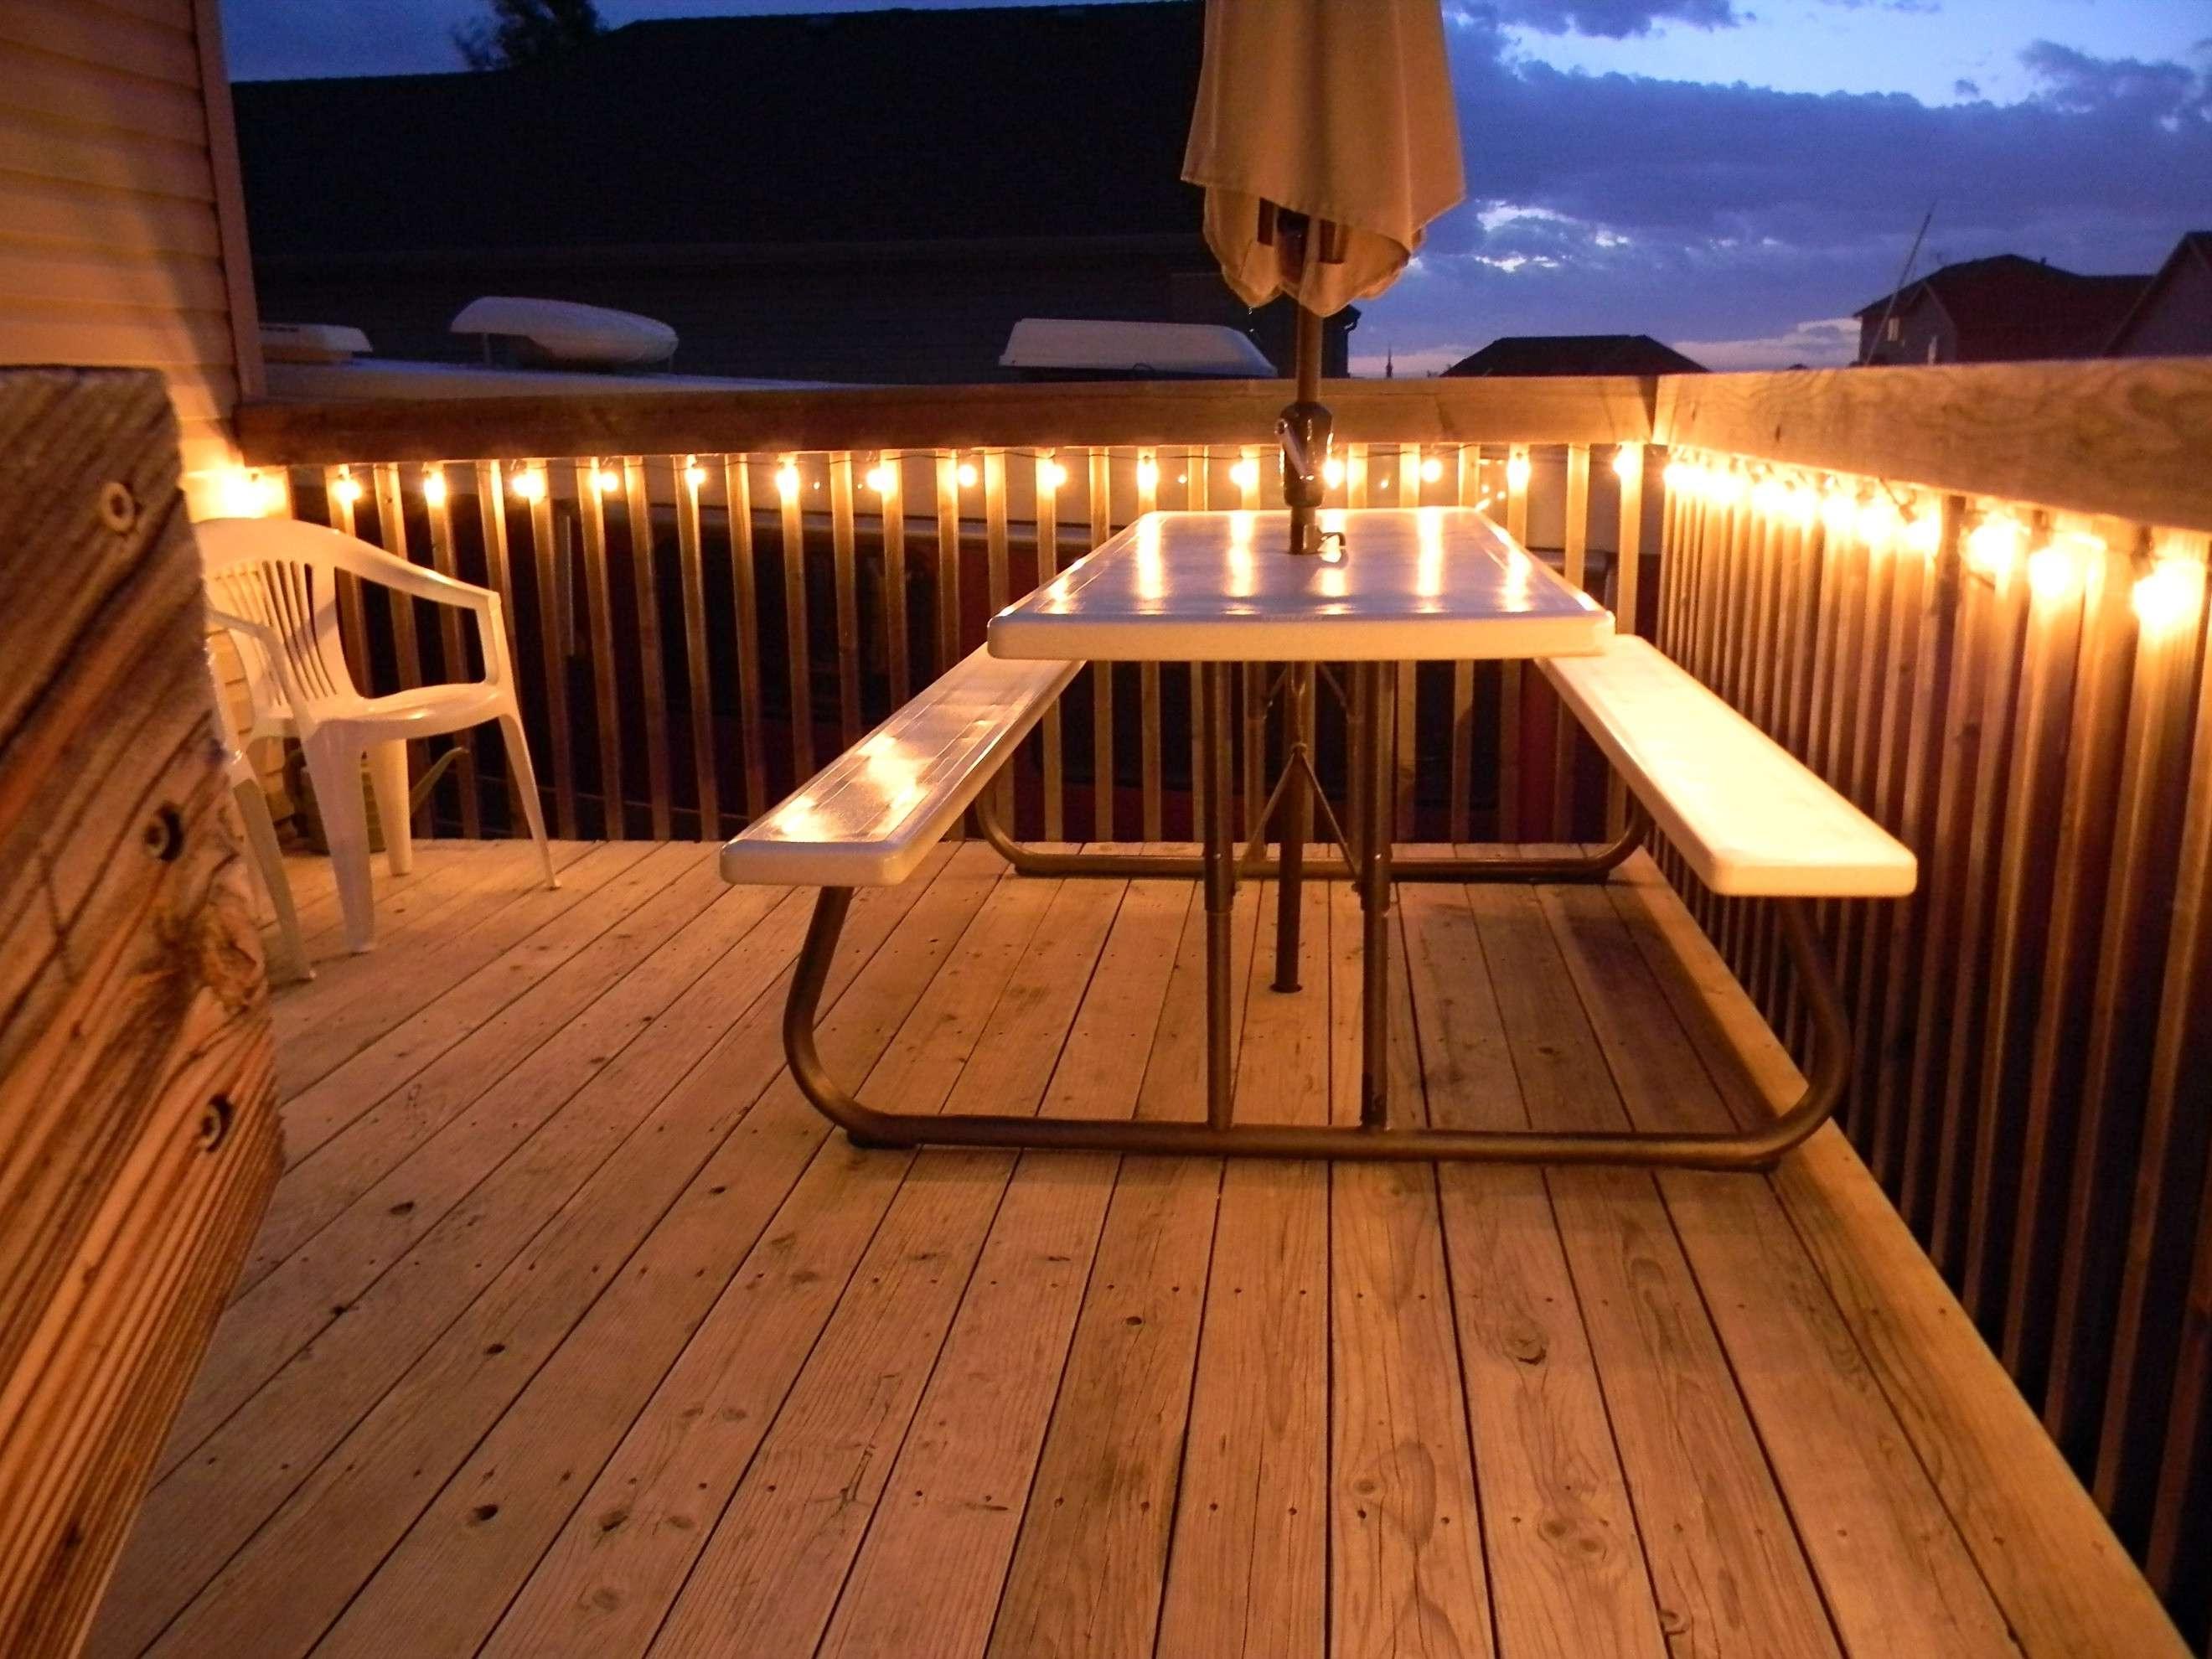 Solar Deck Lighting Kits Wonderful 39 Best Outdoor Deck Lighting With Widely Used Outdoor Deck Lanterns (View 16 of 20)